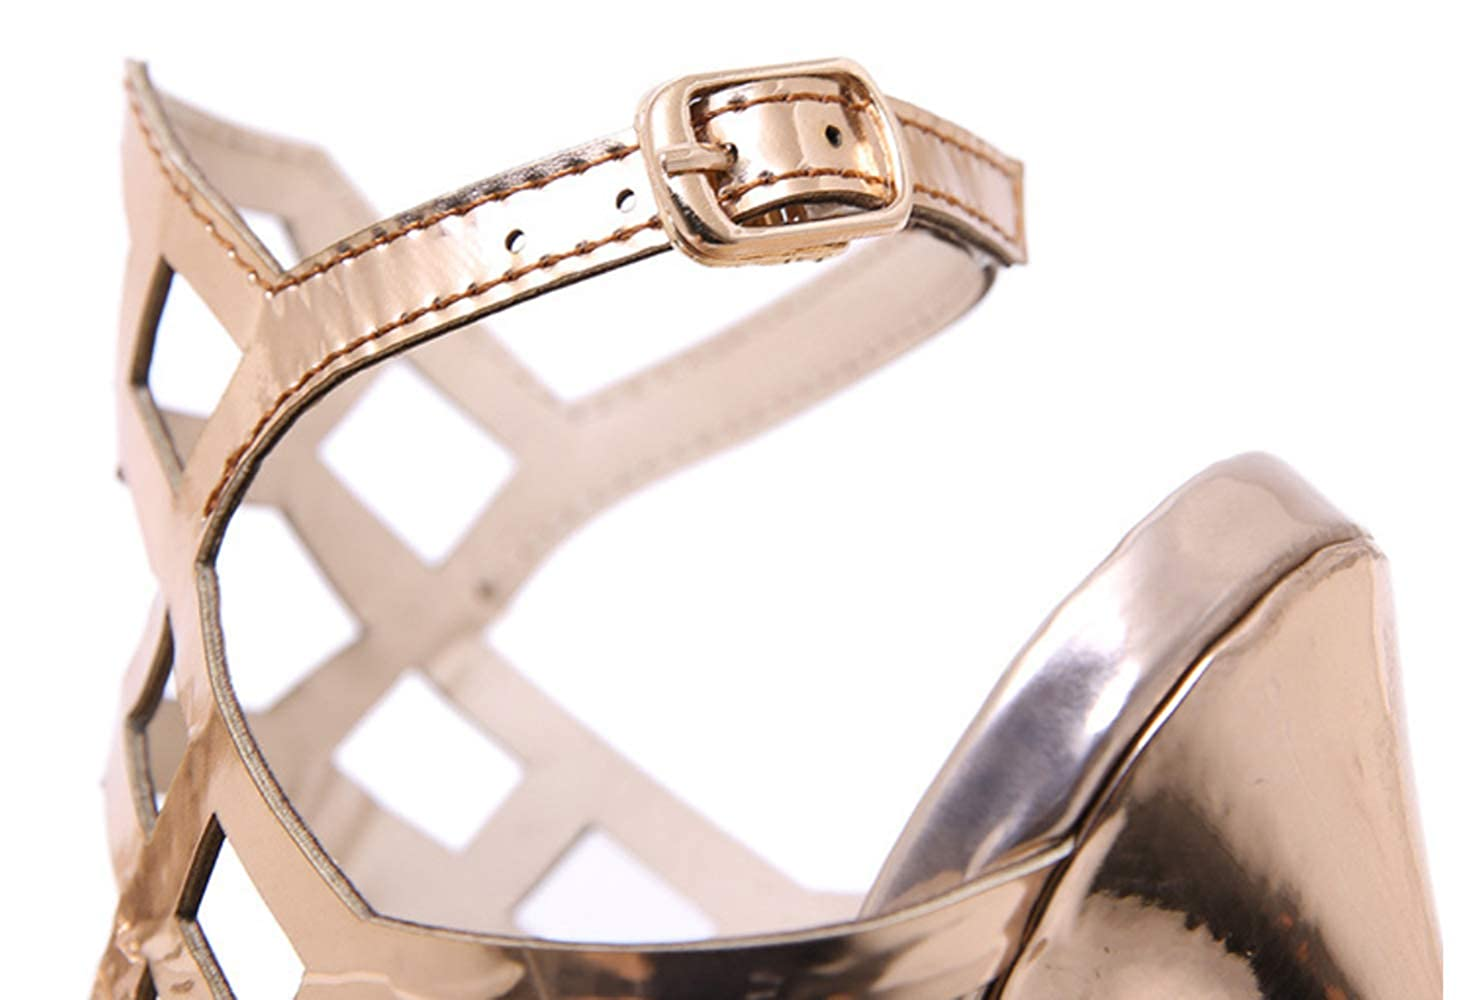 Shiney New Damen Damen Damen Sandalen Hochhackige Schuhe Mode Stöckelschuhe 96e754